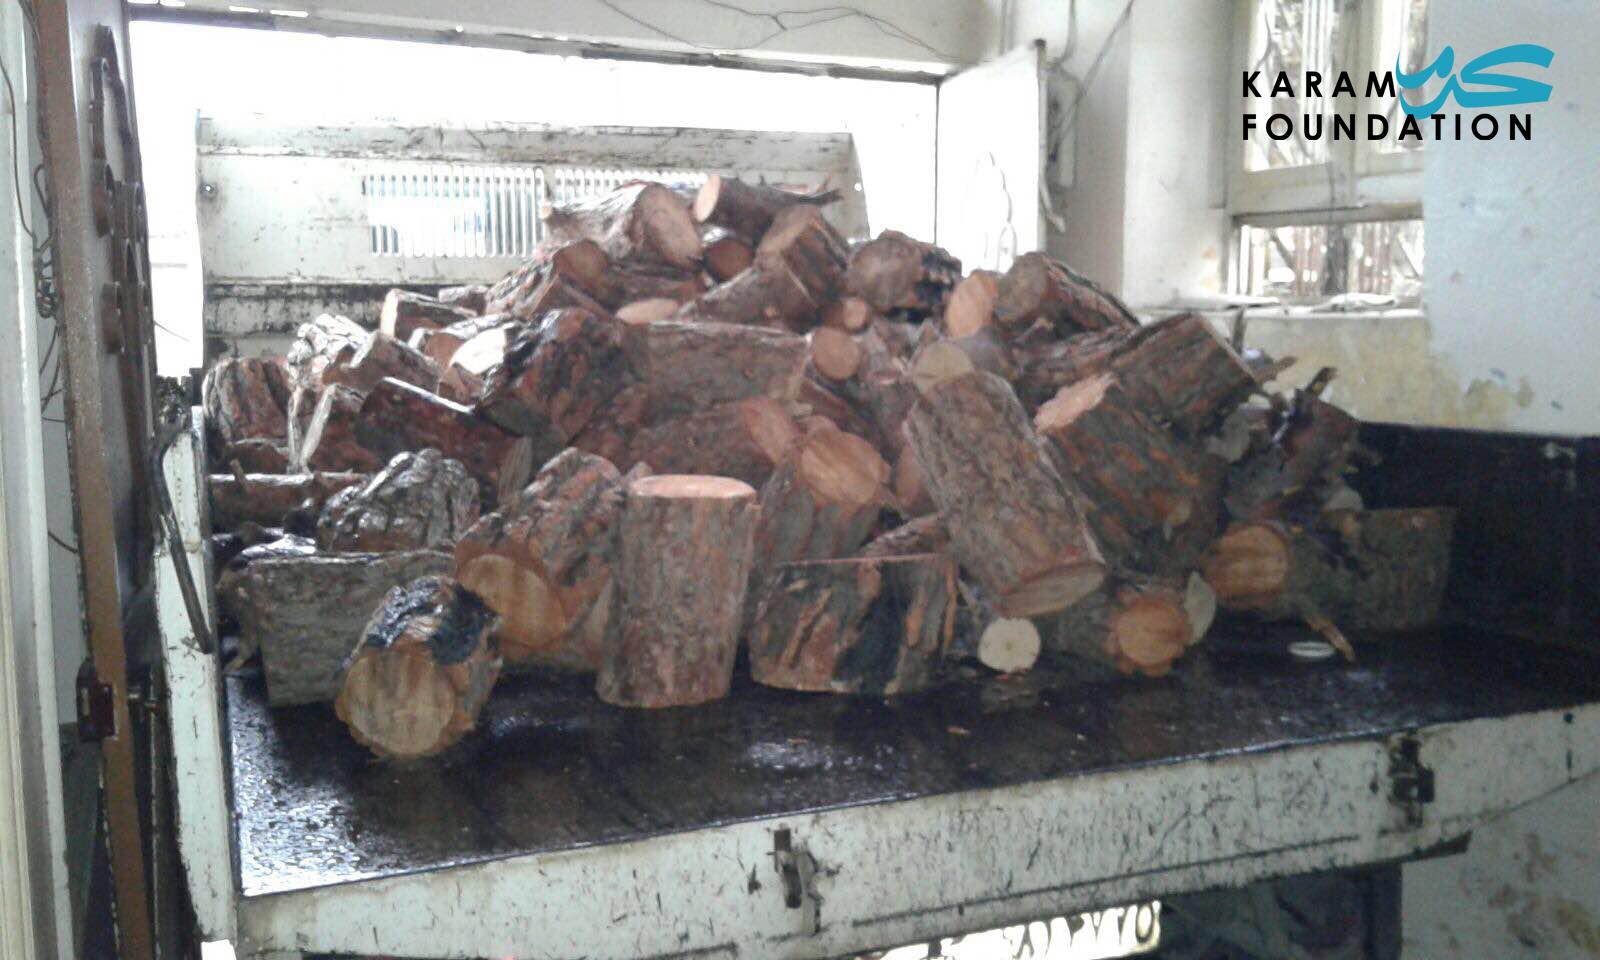 Heating wood distribution in Madaya, January 2016